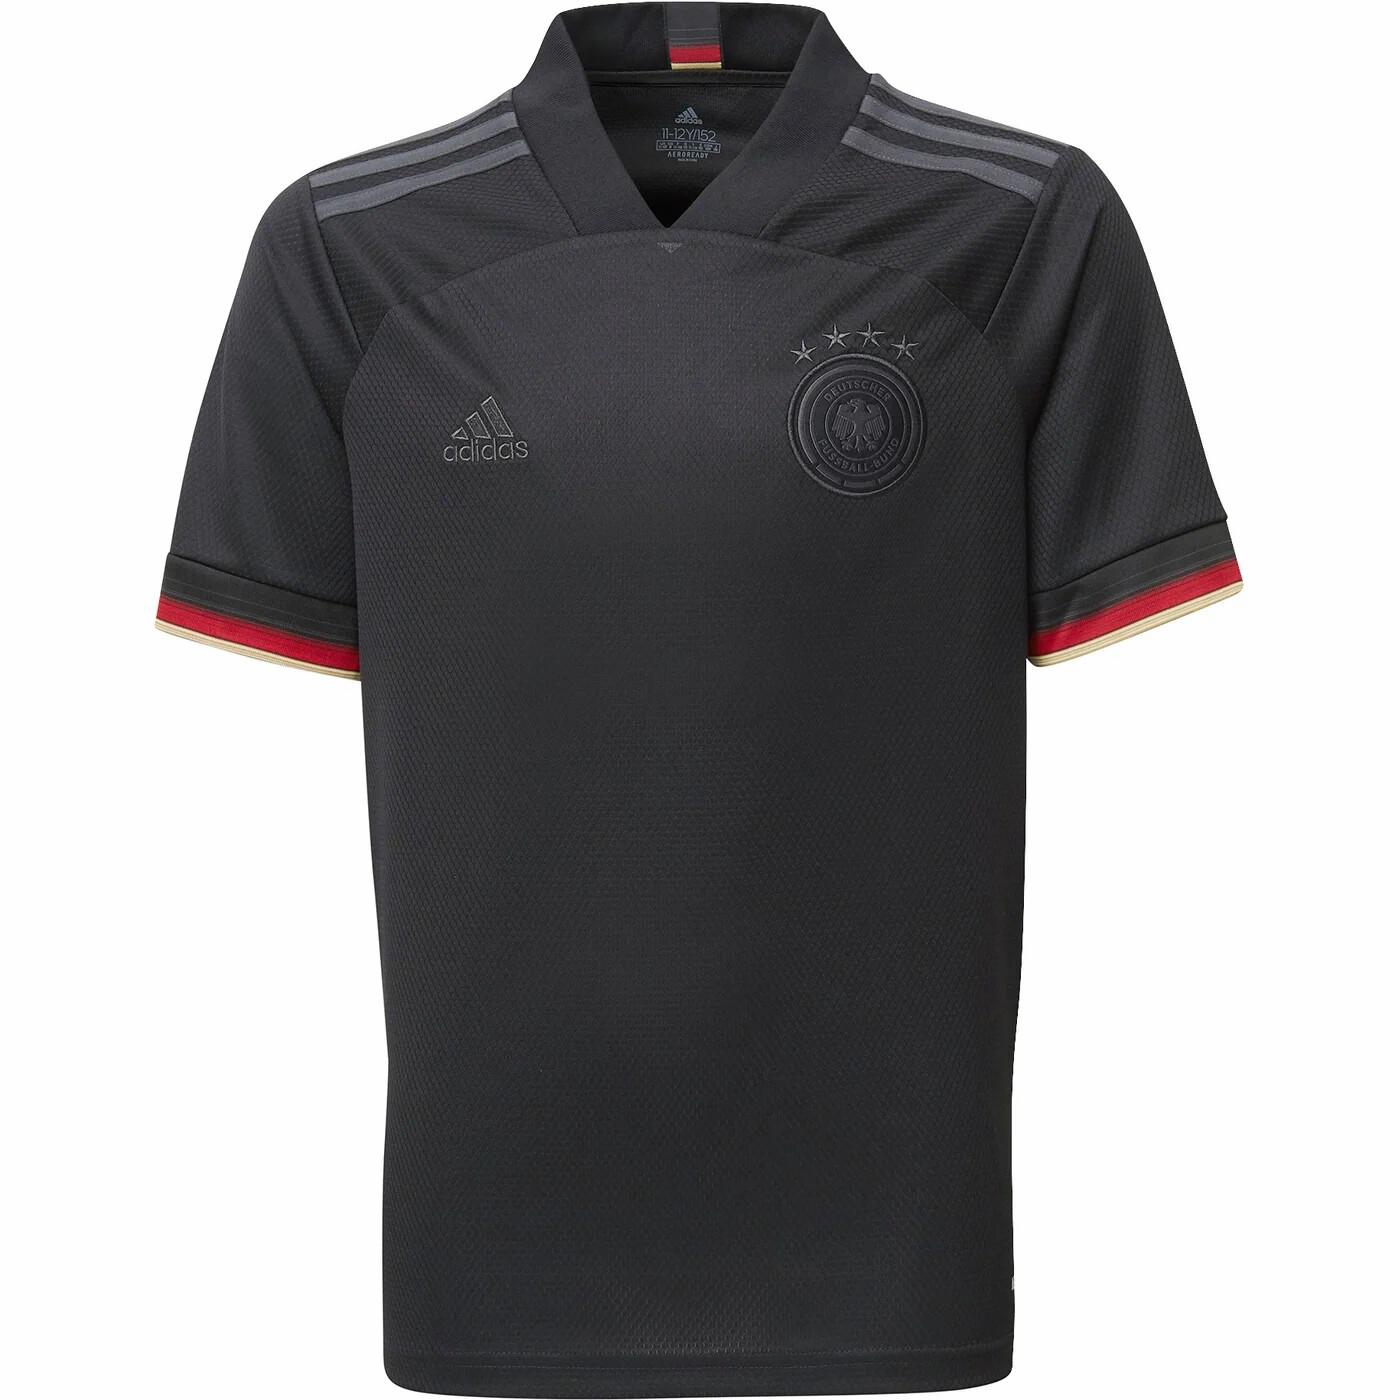 Adidas Kinder Auswärtstrikot DFB